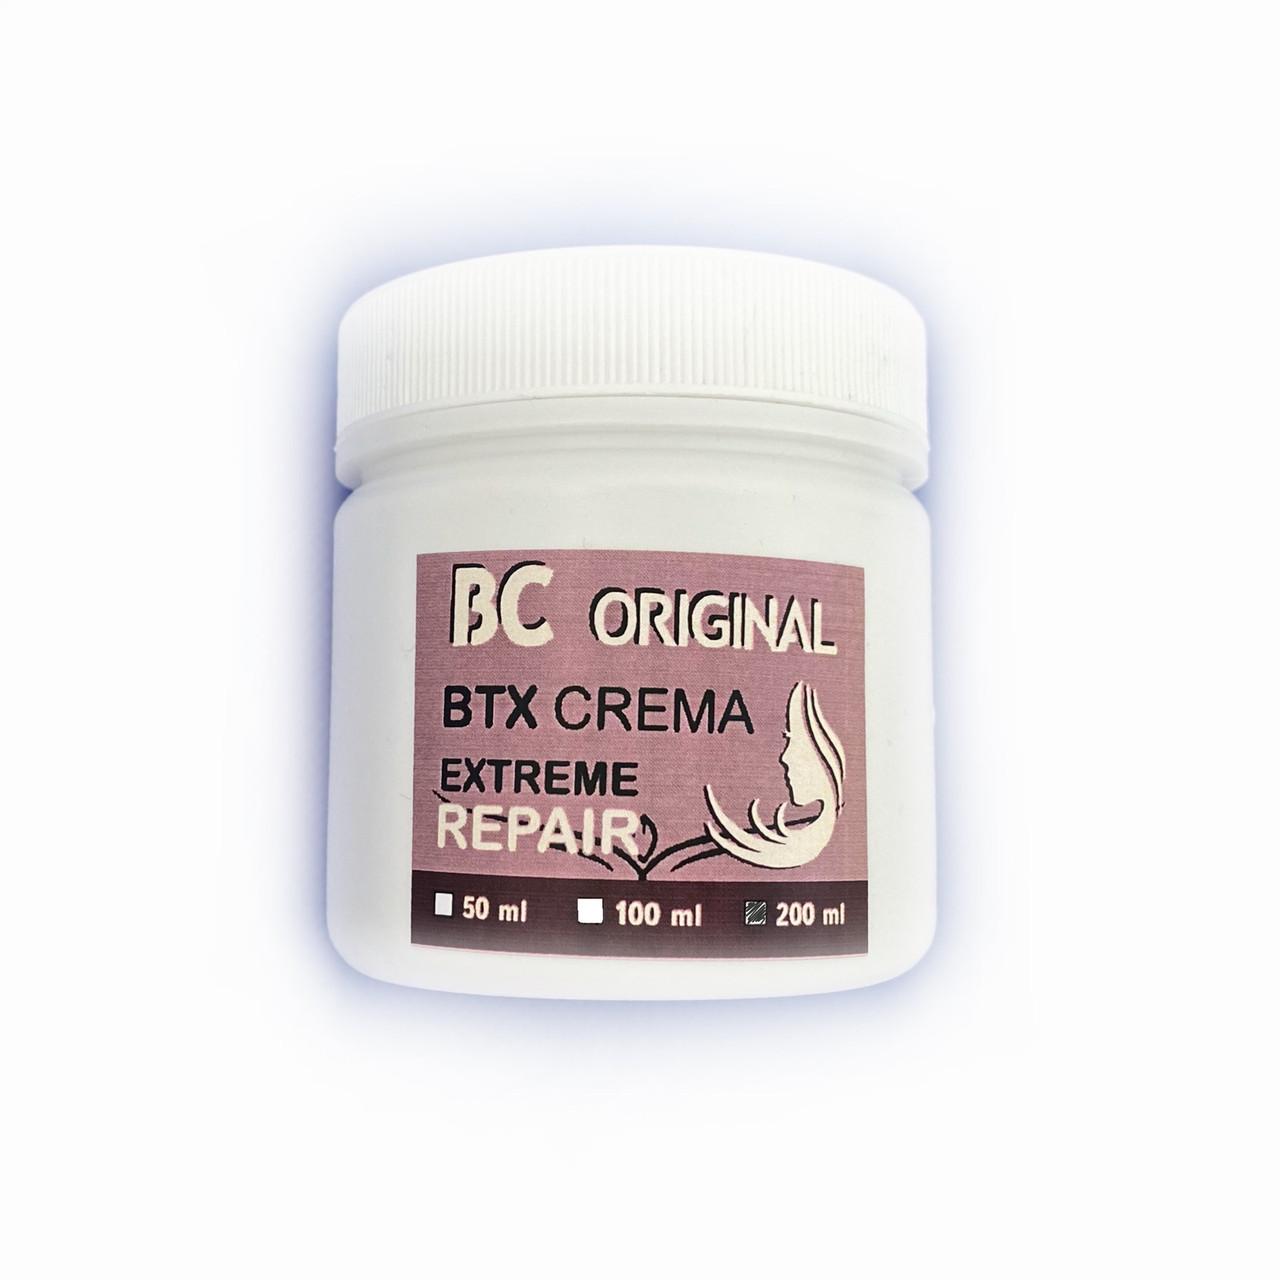 Бoтoкc BC Original BTX Crema, 200 мл